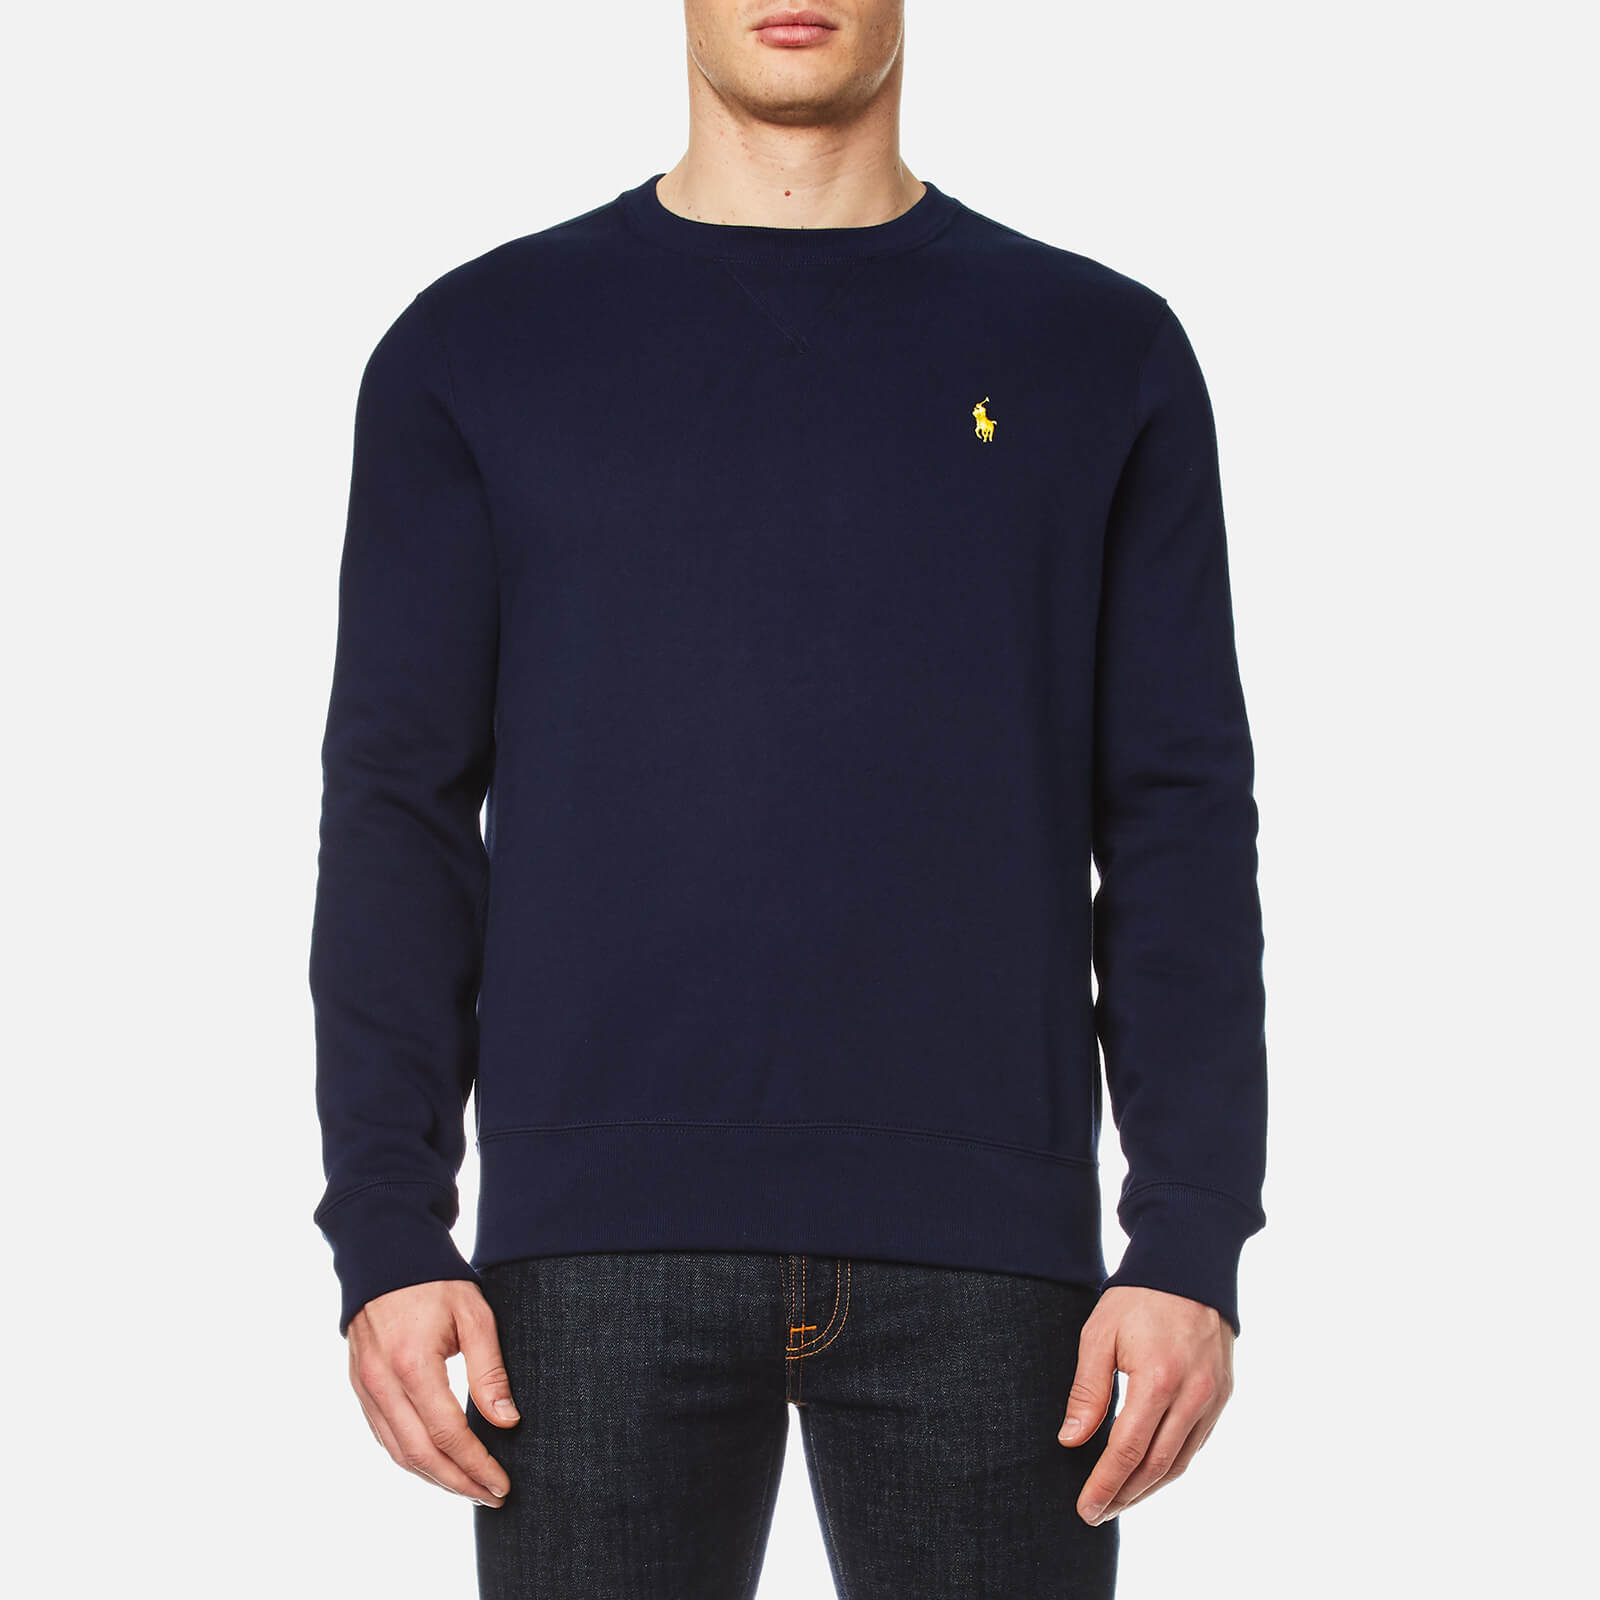 ba3fecab9 Polo Ralph Lauren Men s Long Sleeve Crew Neck Sweatshirt - Cruise Navy -  Free UK Delivery over £50